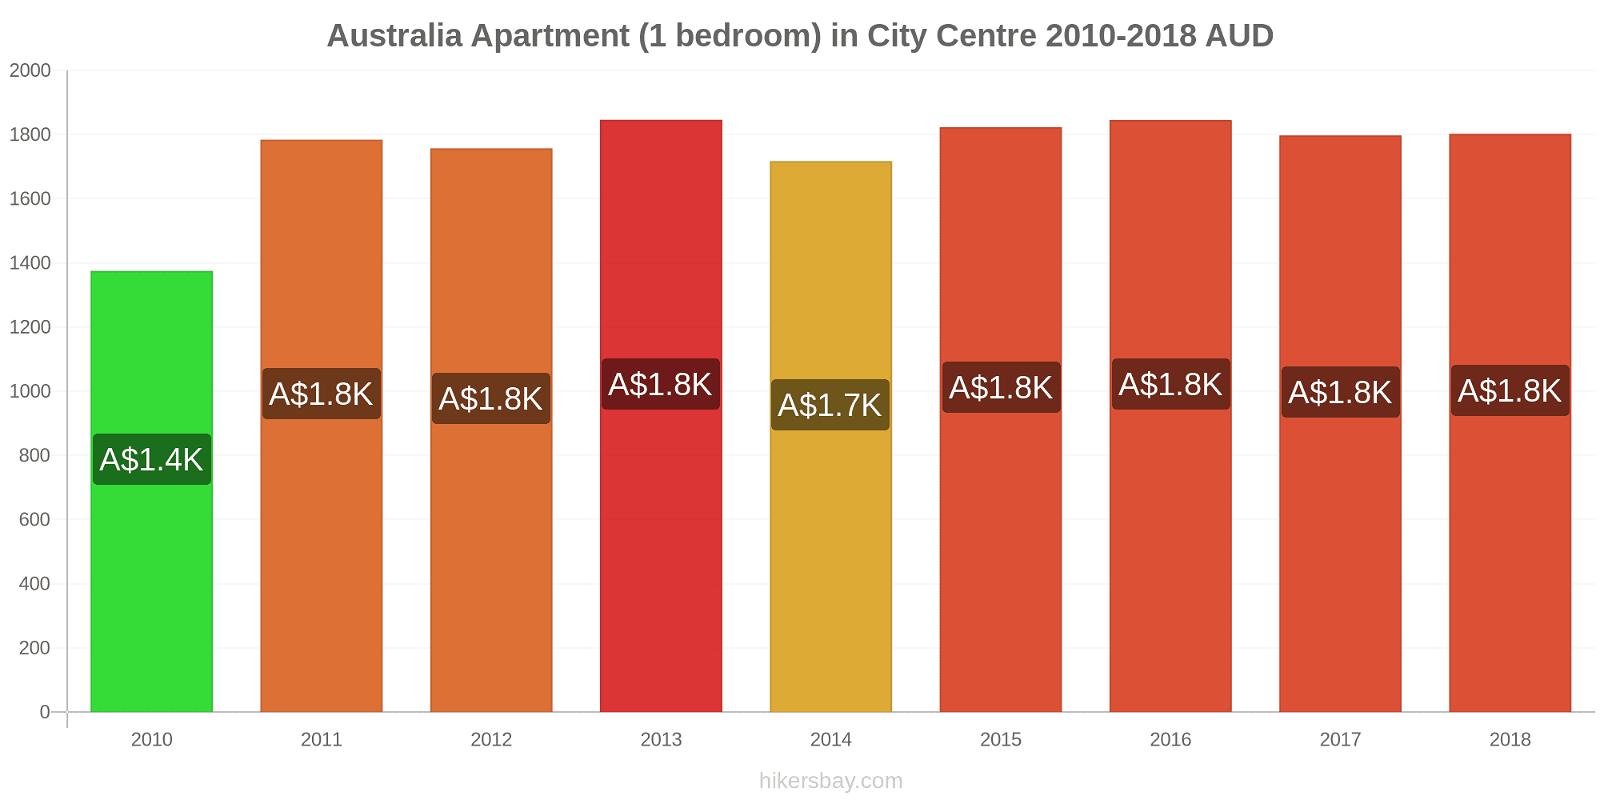 Australia price changes Apartment (1 bedroom) in City Centre hikersbay.com